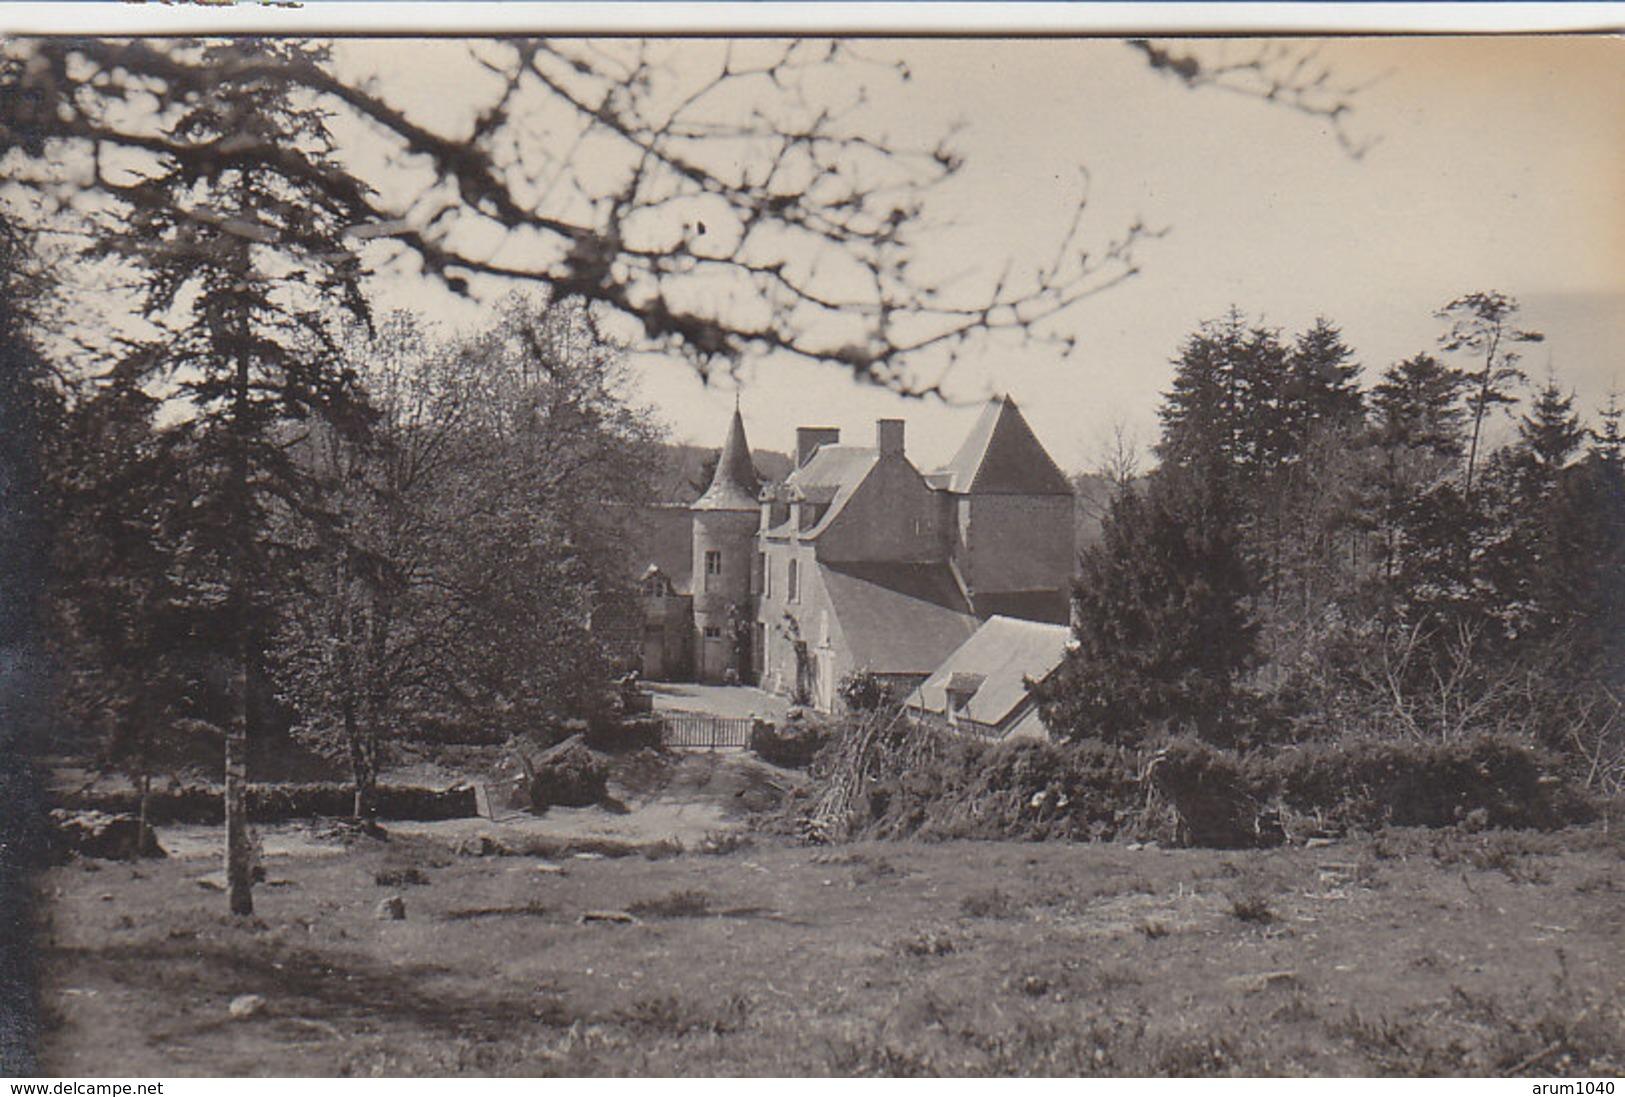 29 : Manoir Breton à Localiser - Photo Format 9x14 - Document Rare ! - France